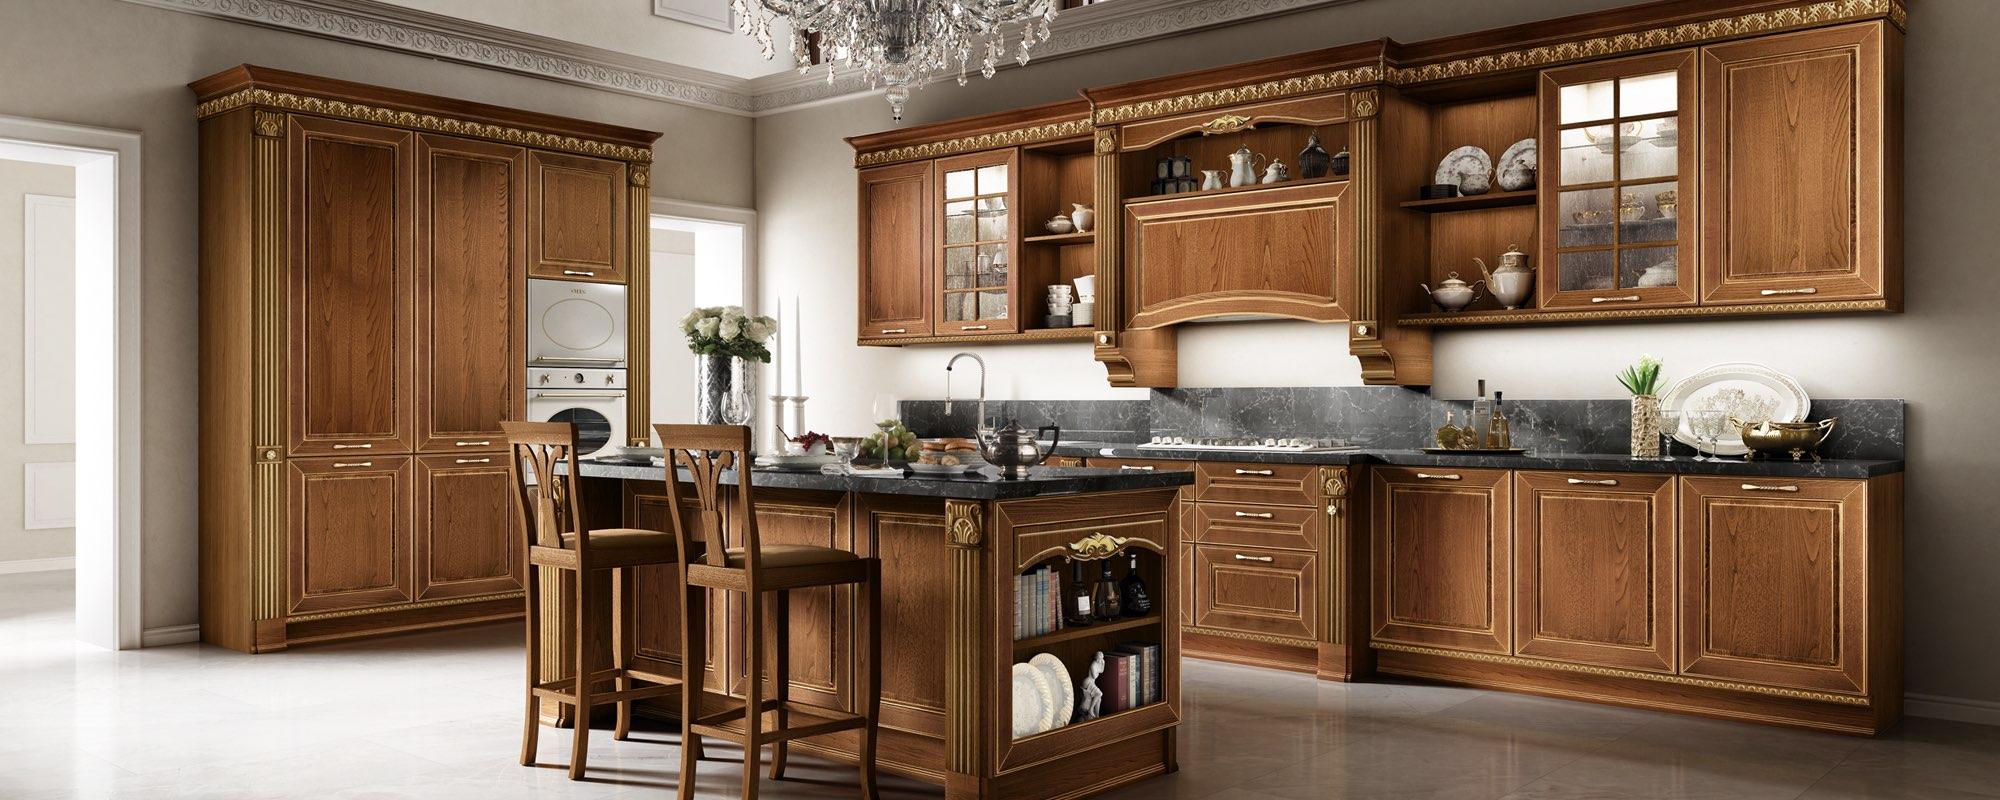 vista laterale di una cucina bianca in legno classica con sedie in legno -Dolcevita